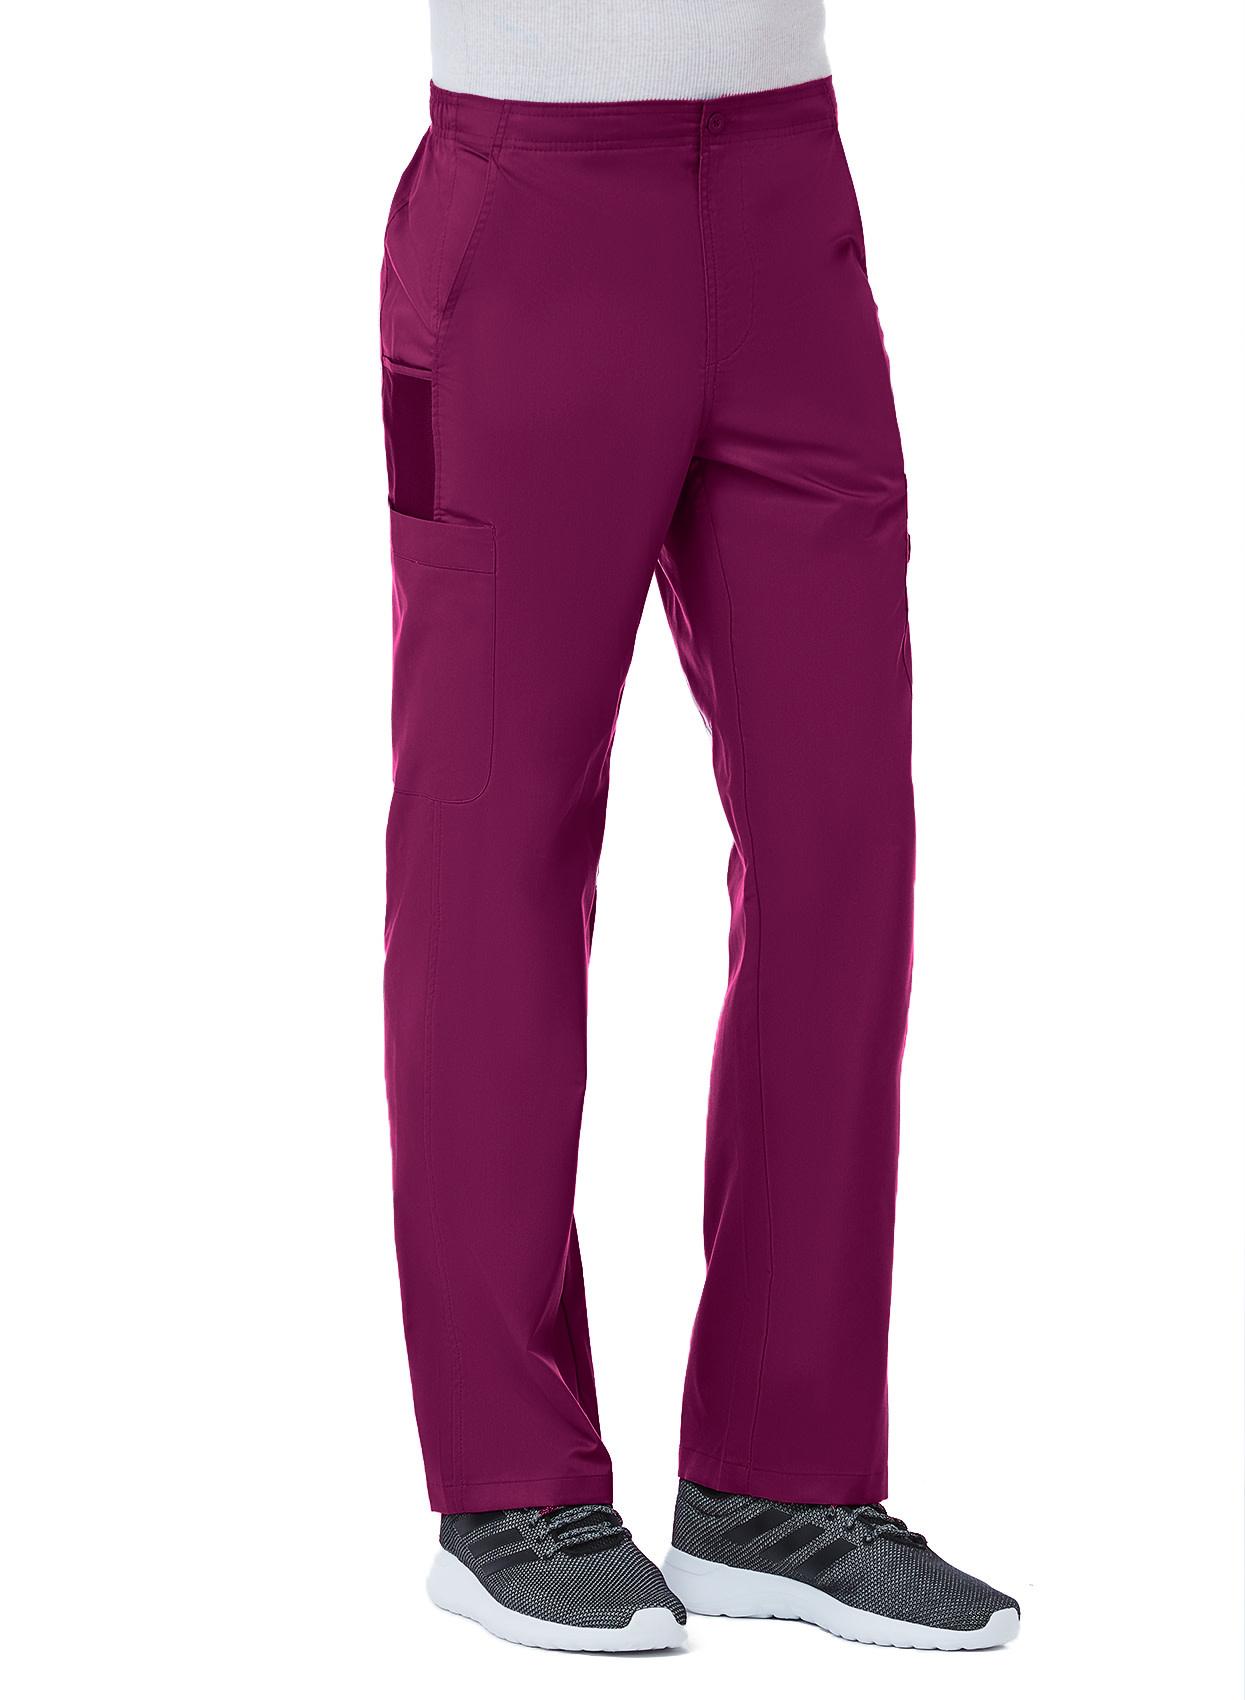 Wine Men's Half Elastic 8-Pocket Tall Cargo Pants 8308T